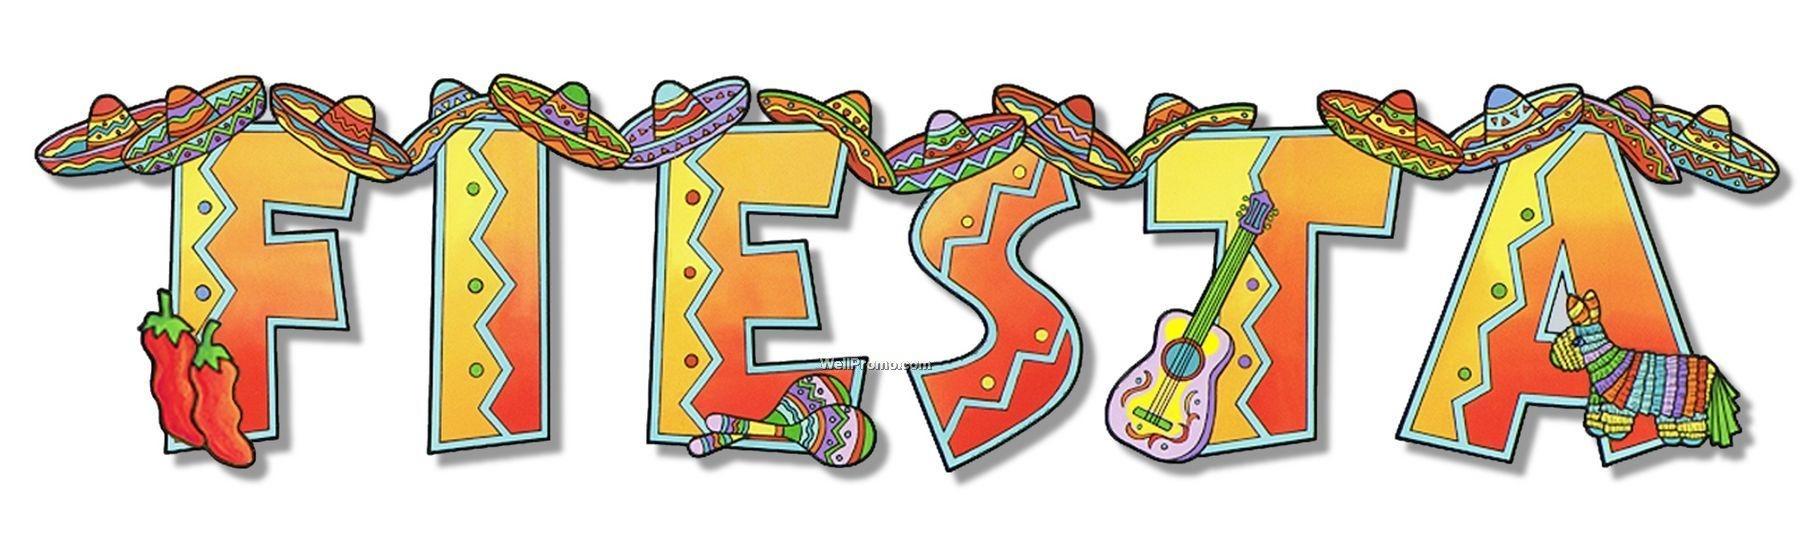 Fiesta clipart Luxury Fiesta Clipart Free Download Clip Art.